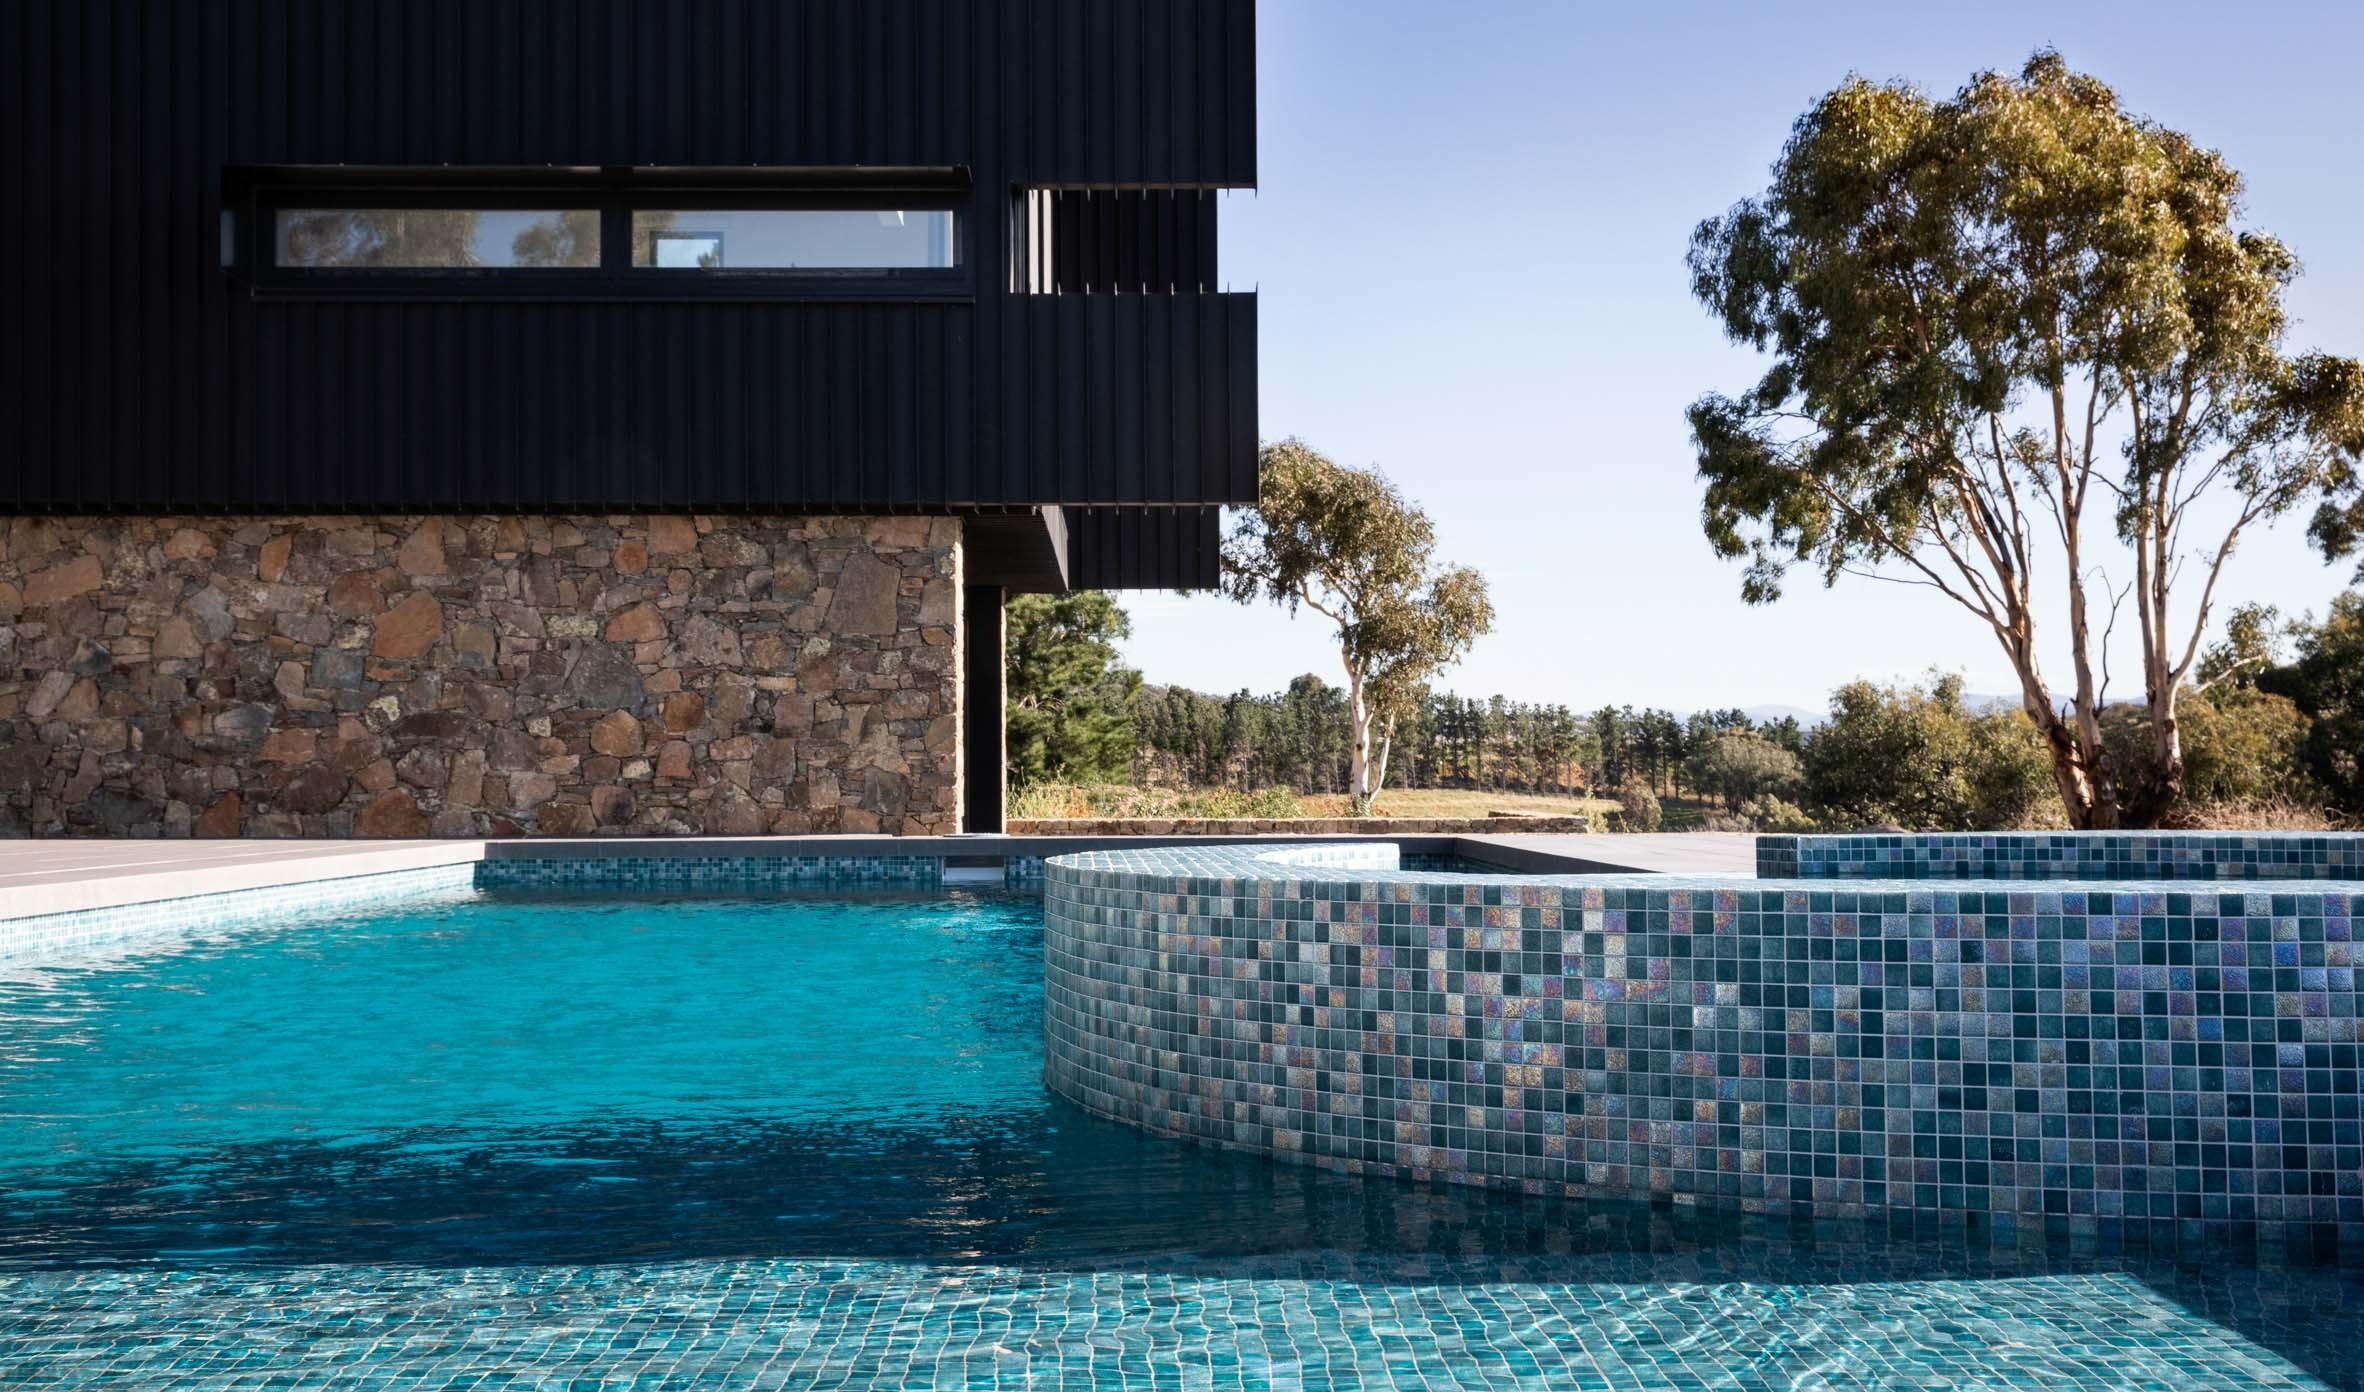 Pool-Tiles Thumbnails pool-tiles-18